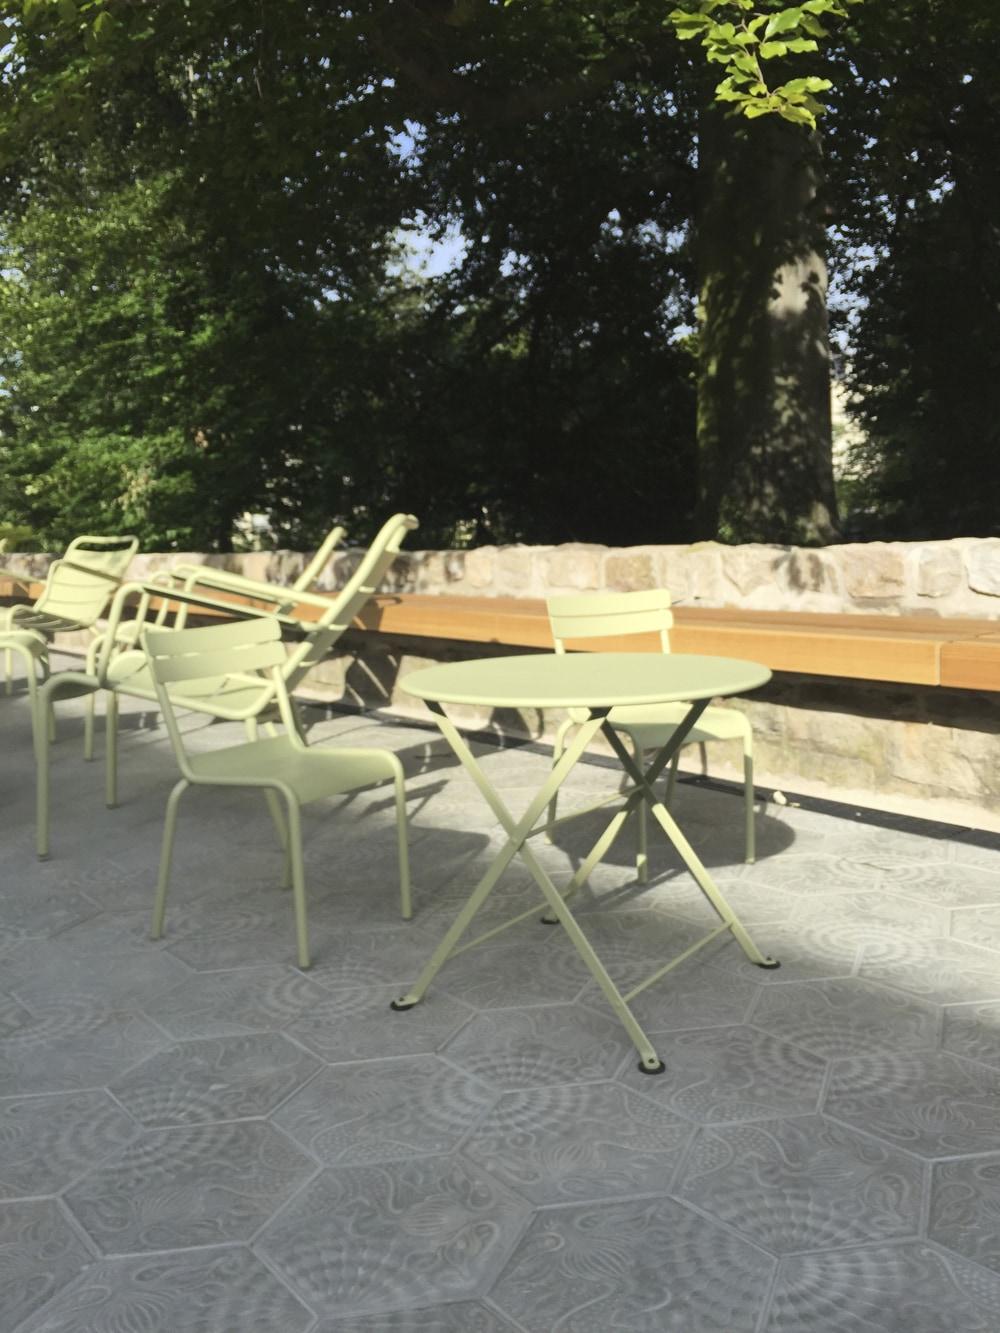 via_trottoirplatten_ap02_terrasse | AP02